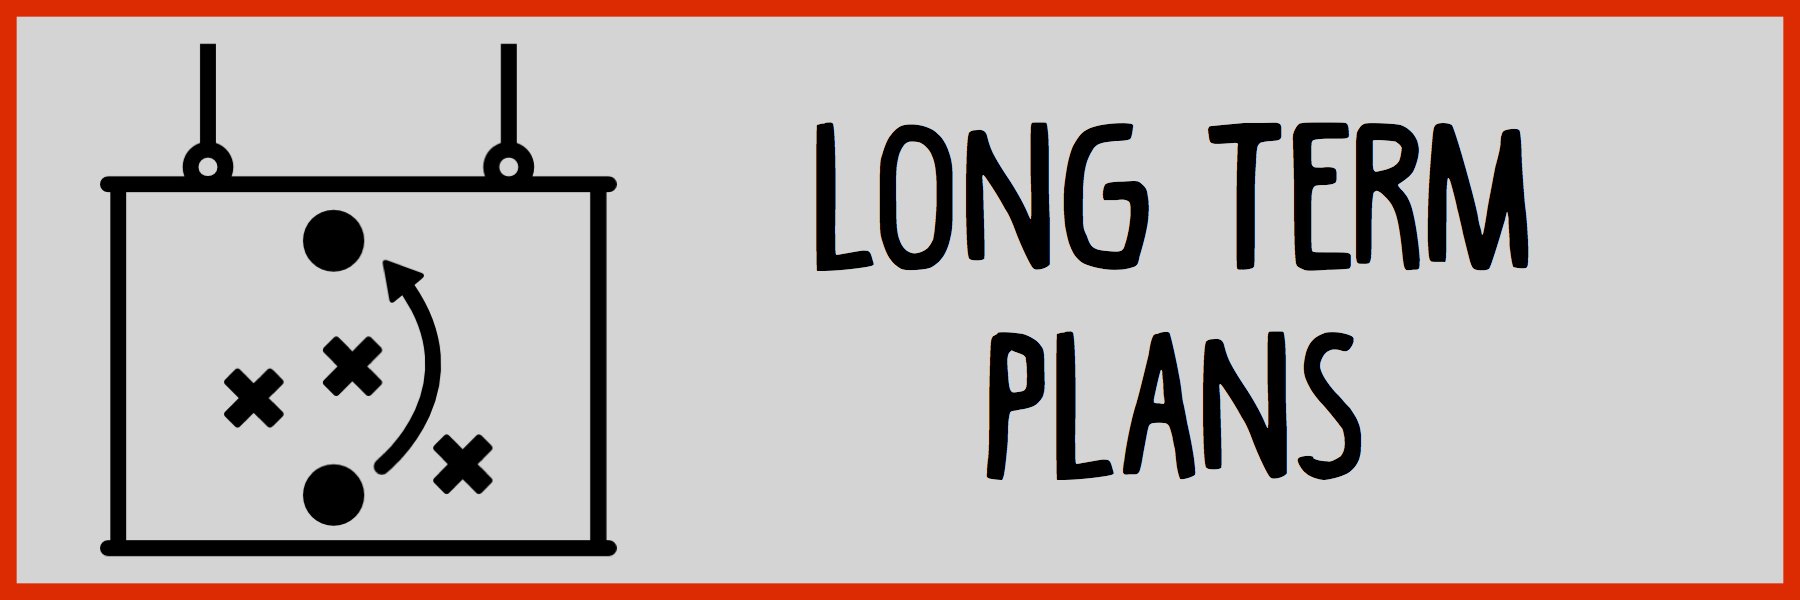 Long Term copy.jpg